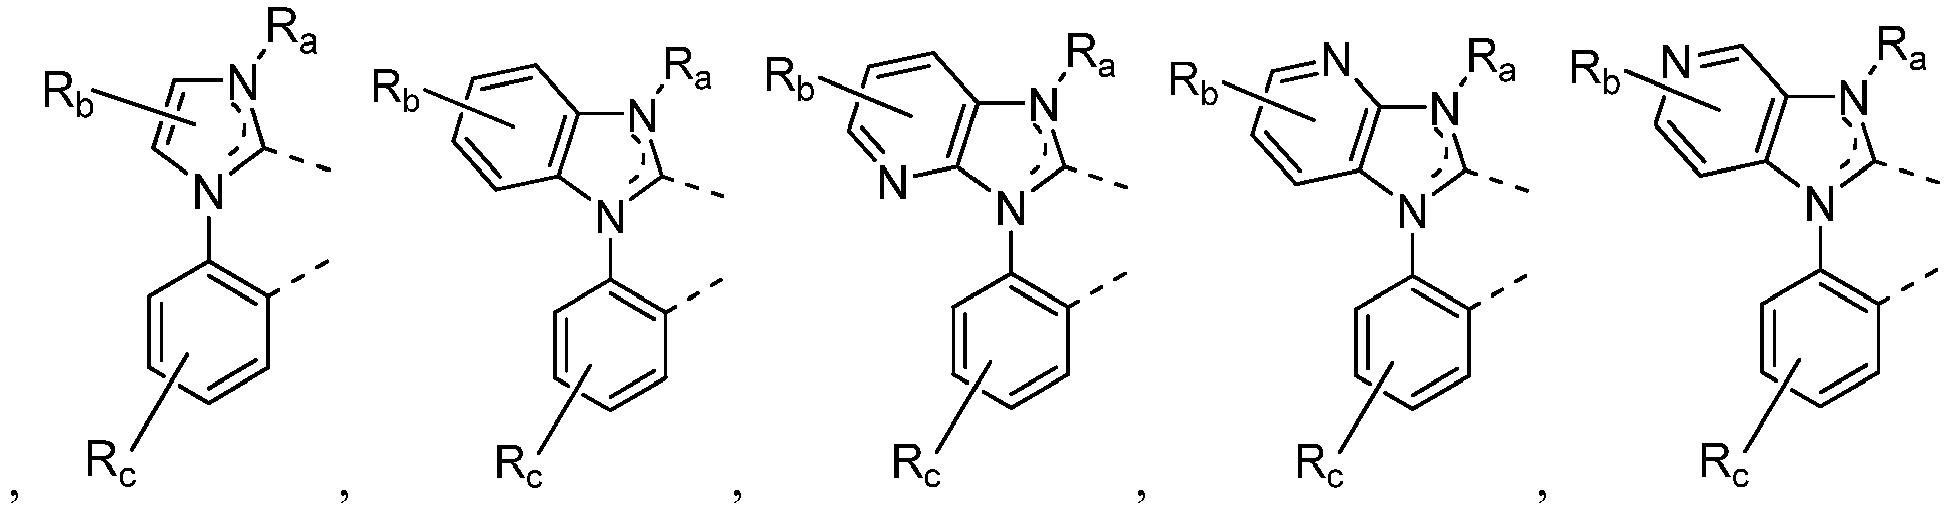 Figure imgb0789